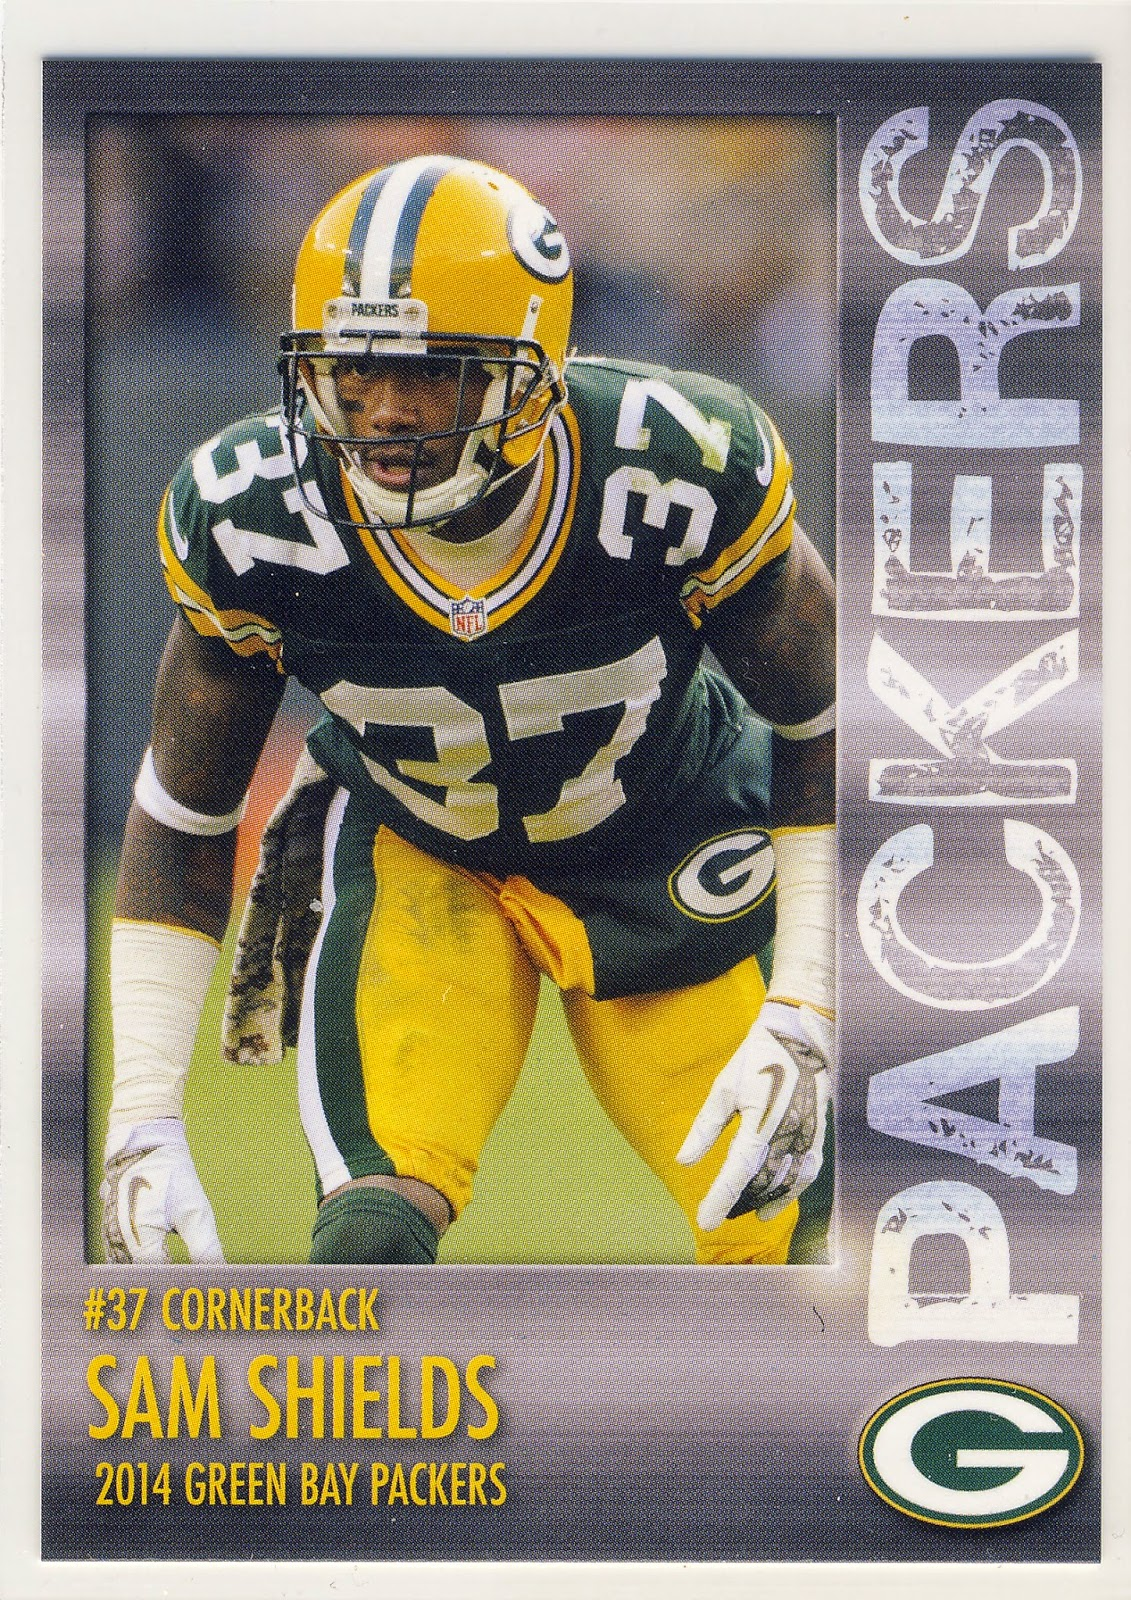 NFL Jerseys Cheap - Heartbreaking Cards of Staggering Genius: 2014 Green Bay Packer ...